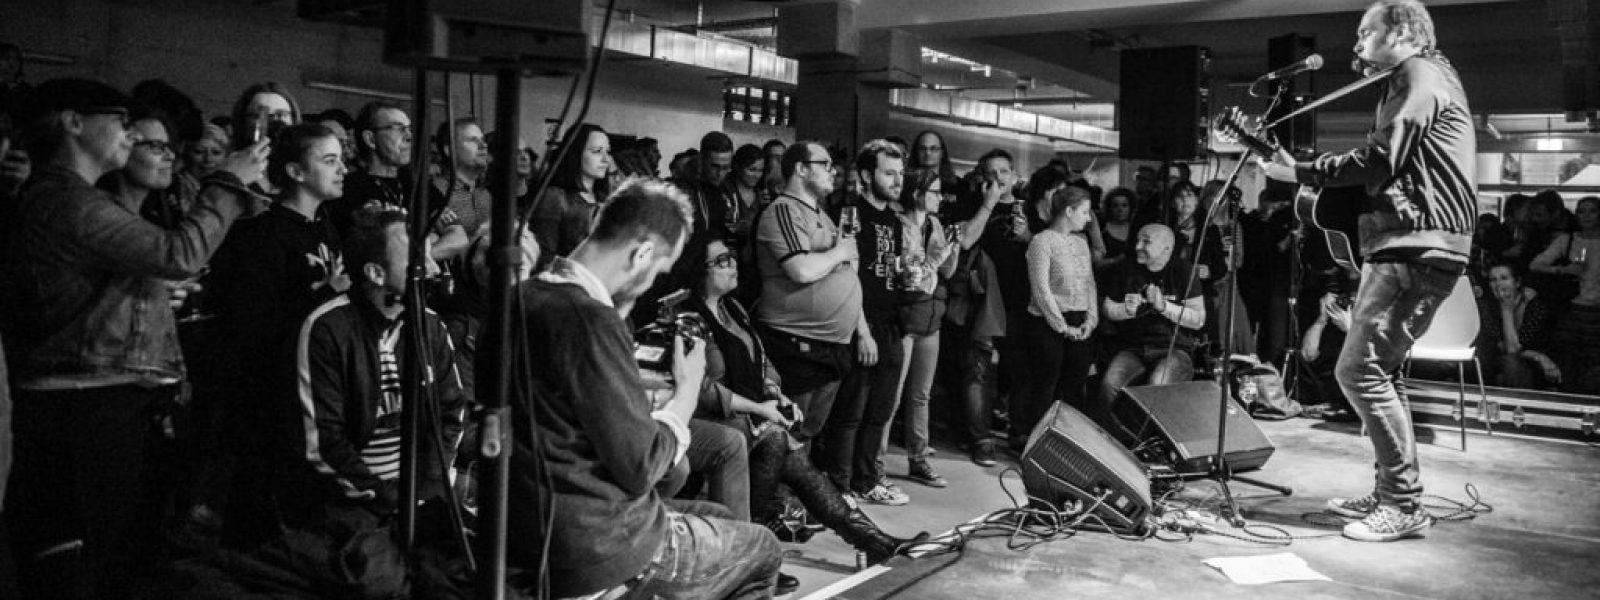 Weinfest gegen Rassismus (Fotos Sabrina Adeline Nagel) - 81